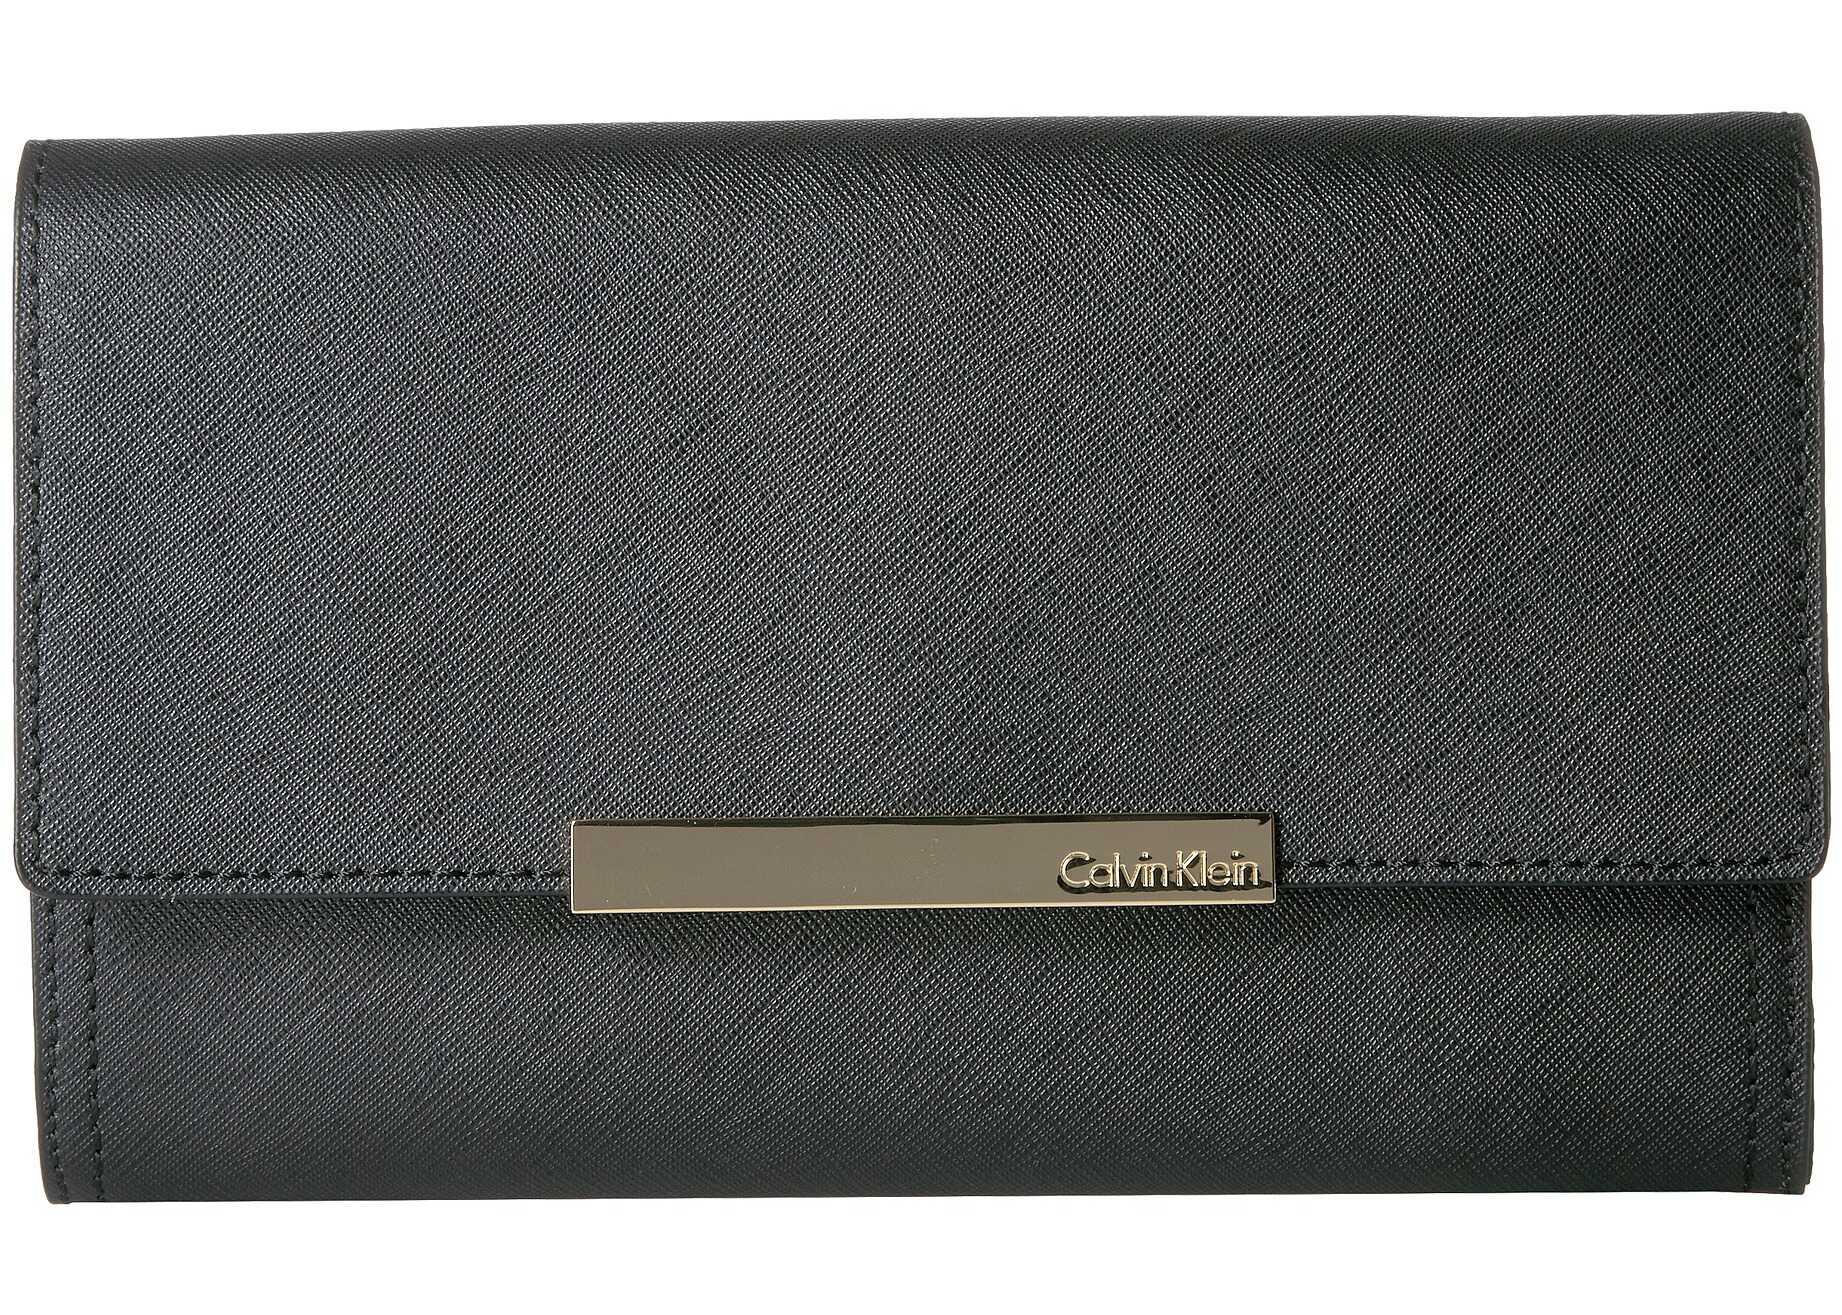 Calvin Klein Evening Saffiano Clutch Black/Gold